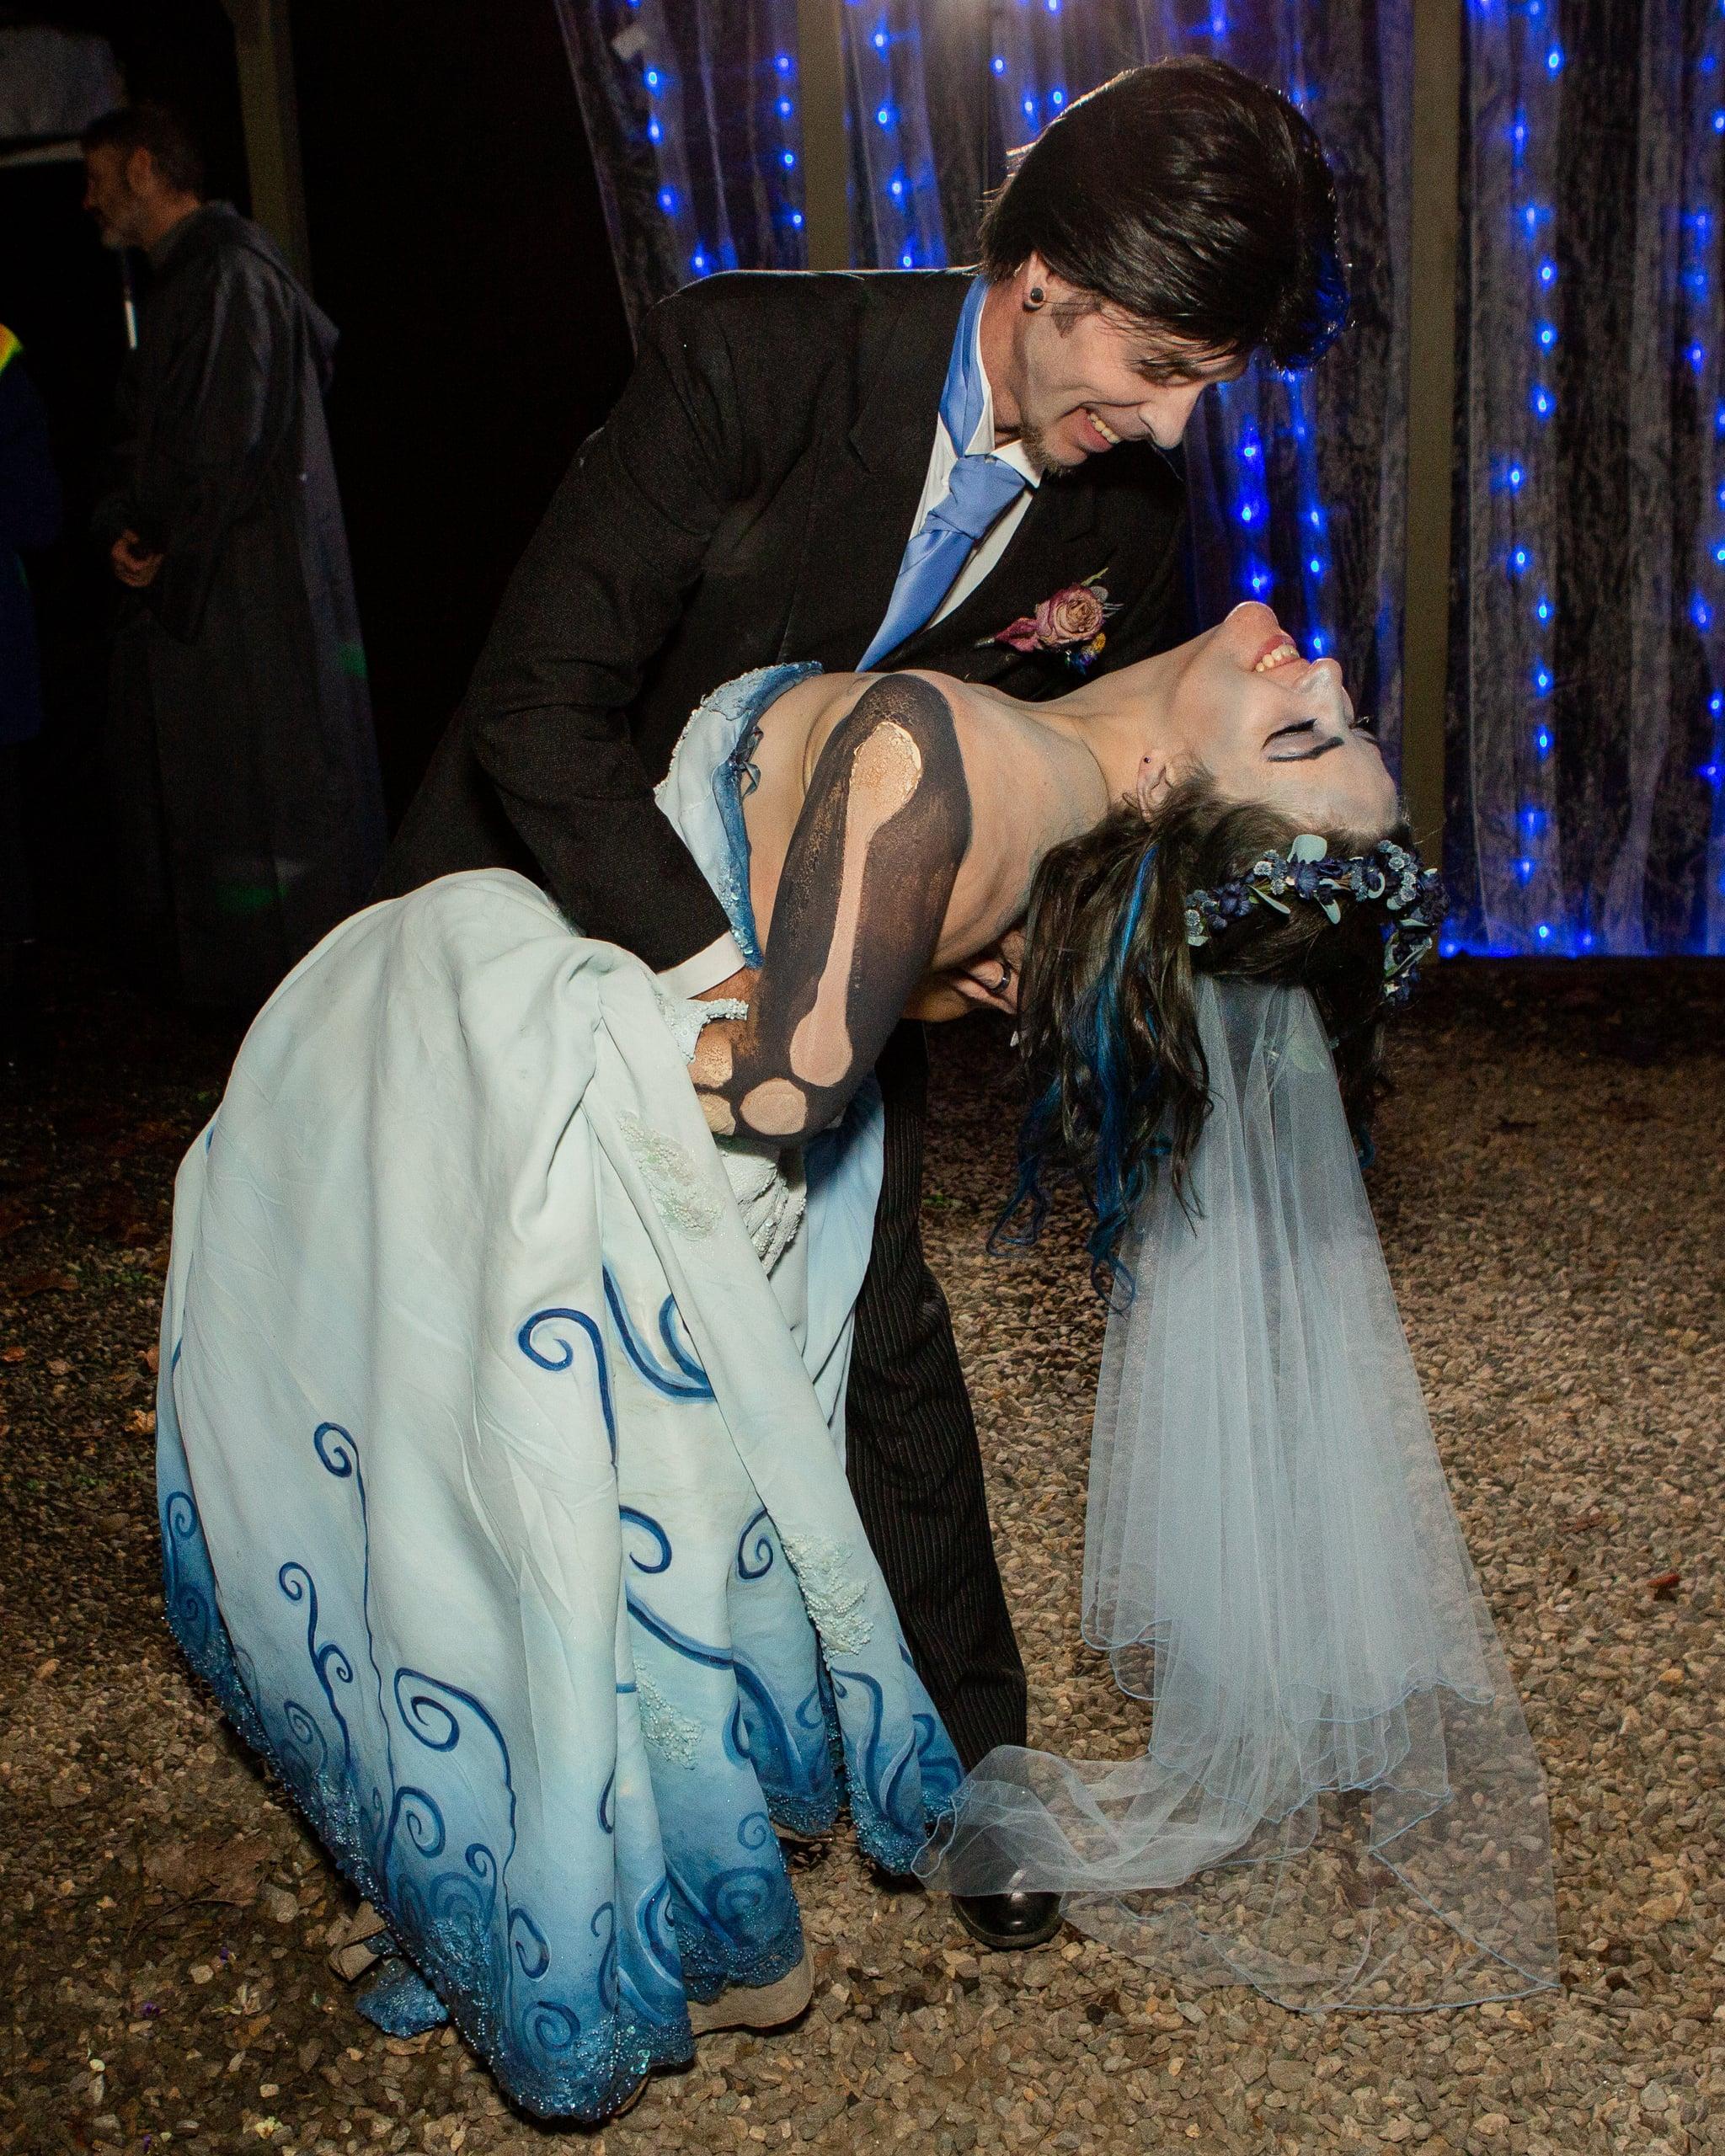 Tim Burton Corpse Bride Wedding Ideas Popsugar Love Sex